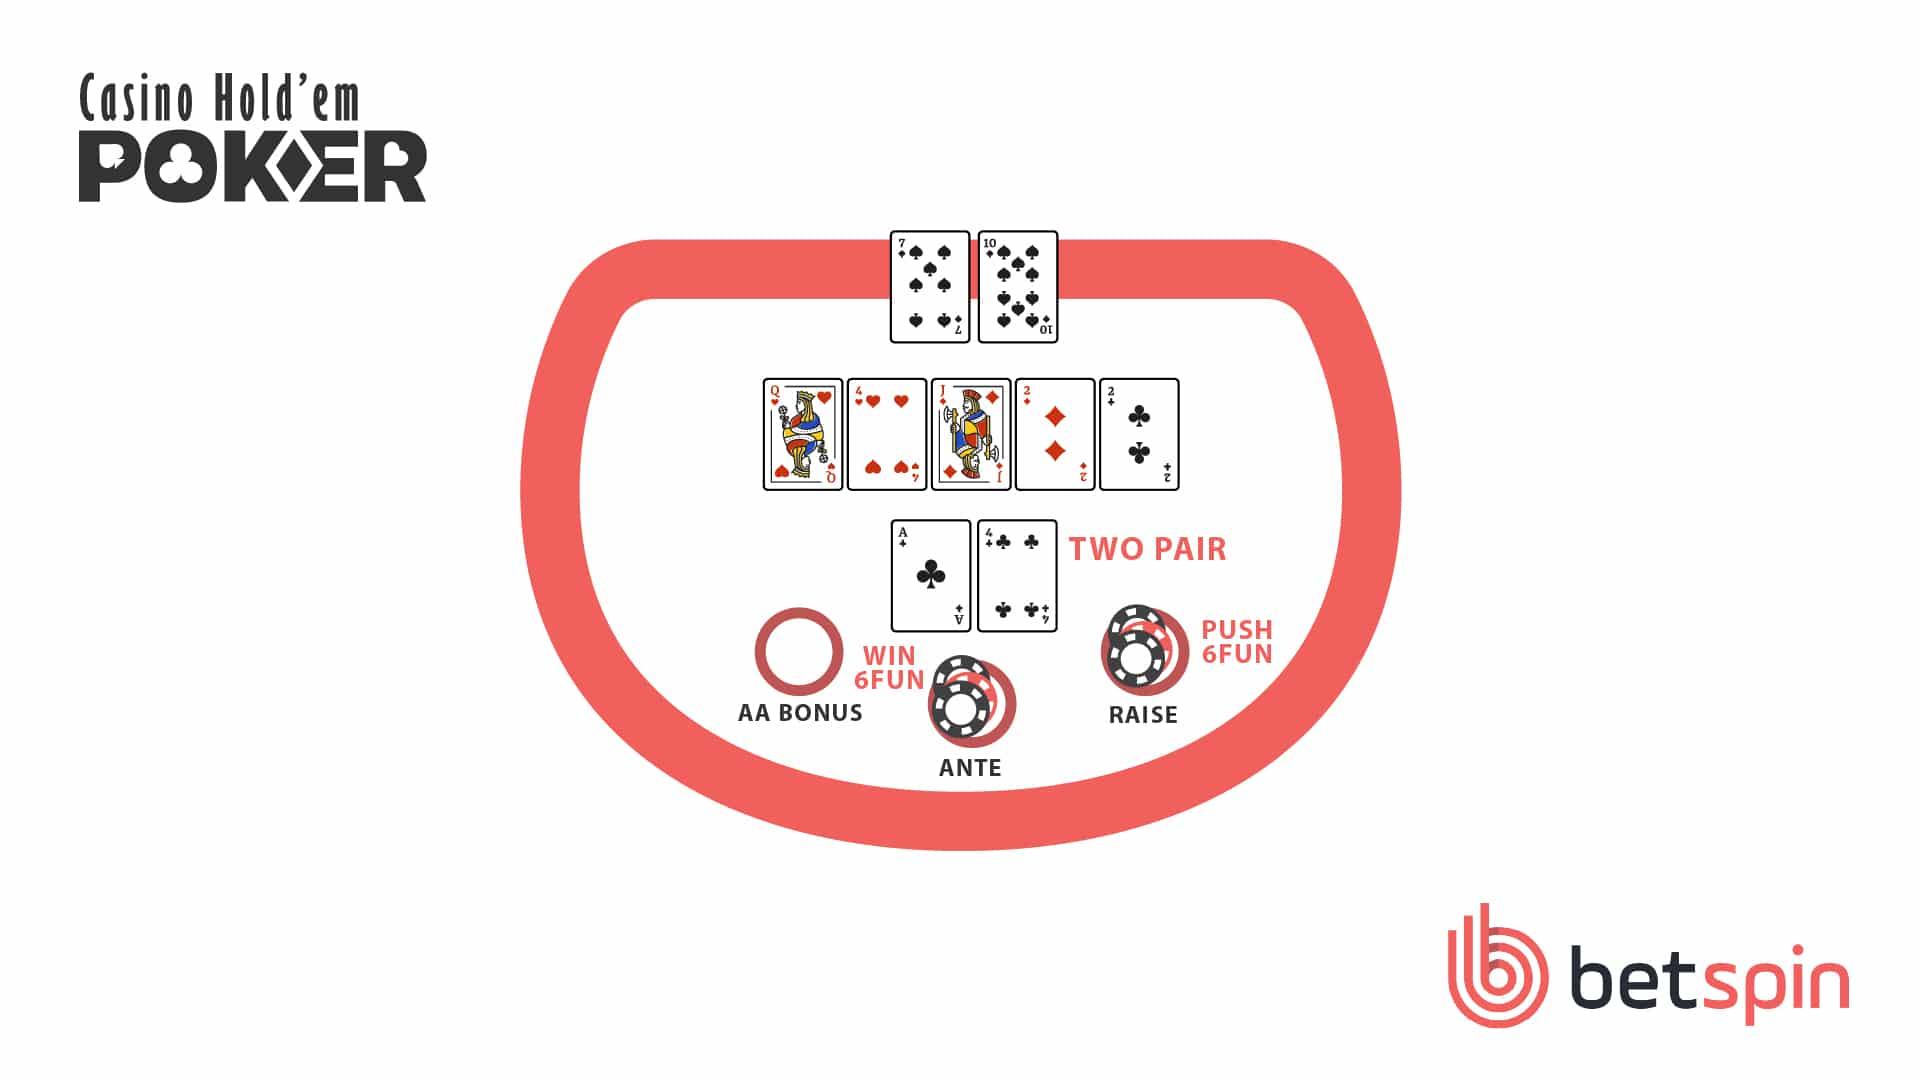 Casino Holdem Step 4